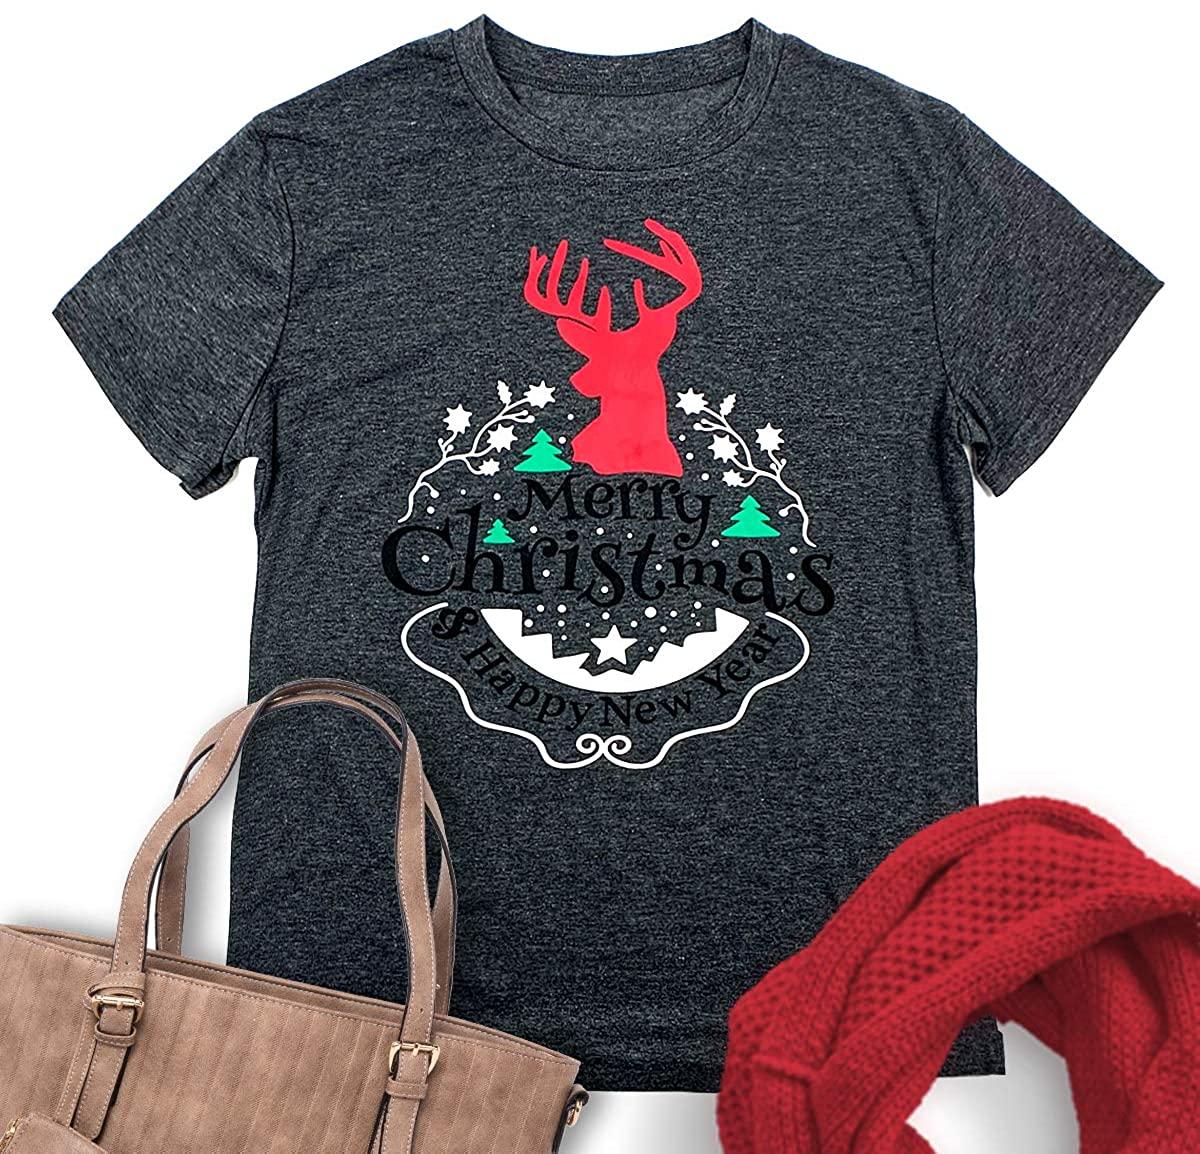 DXVLOIW Merry Christmas Shirt Women's Giraffe Printed T-Shirt Short Sleeve Christmas Tree Graphic Shirt